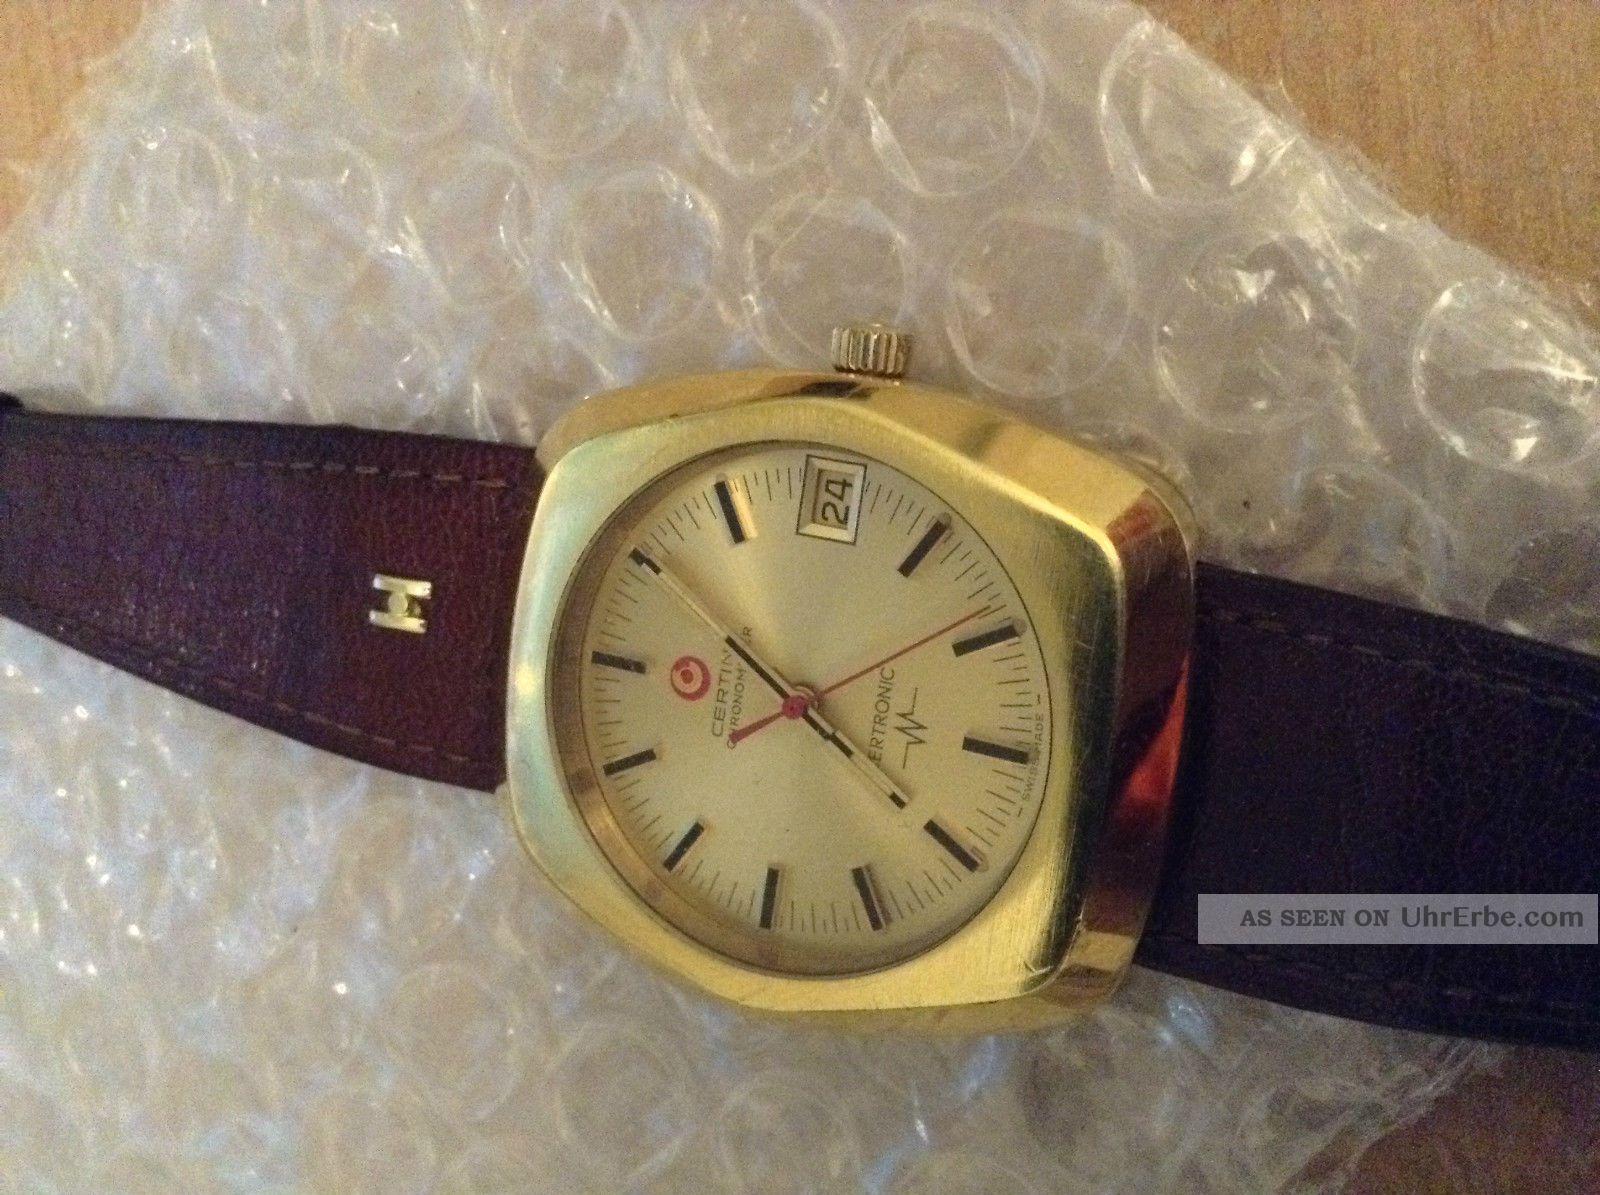 Rar Certina Certronic Chronometer Herren Armbanduhr Stimmgabel Datum Vergoldet Armbanduhren Bild